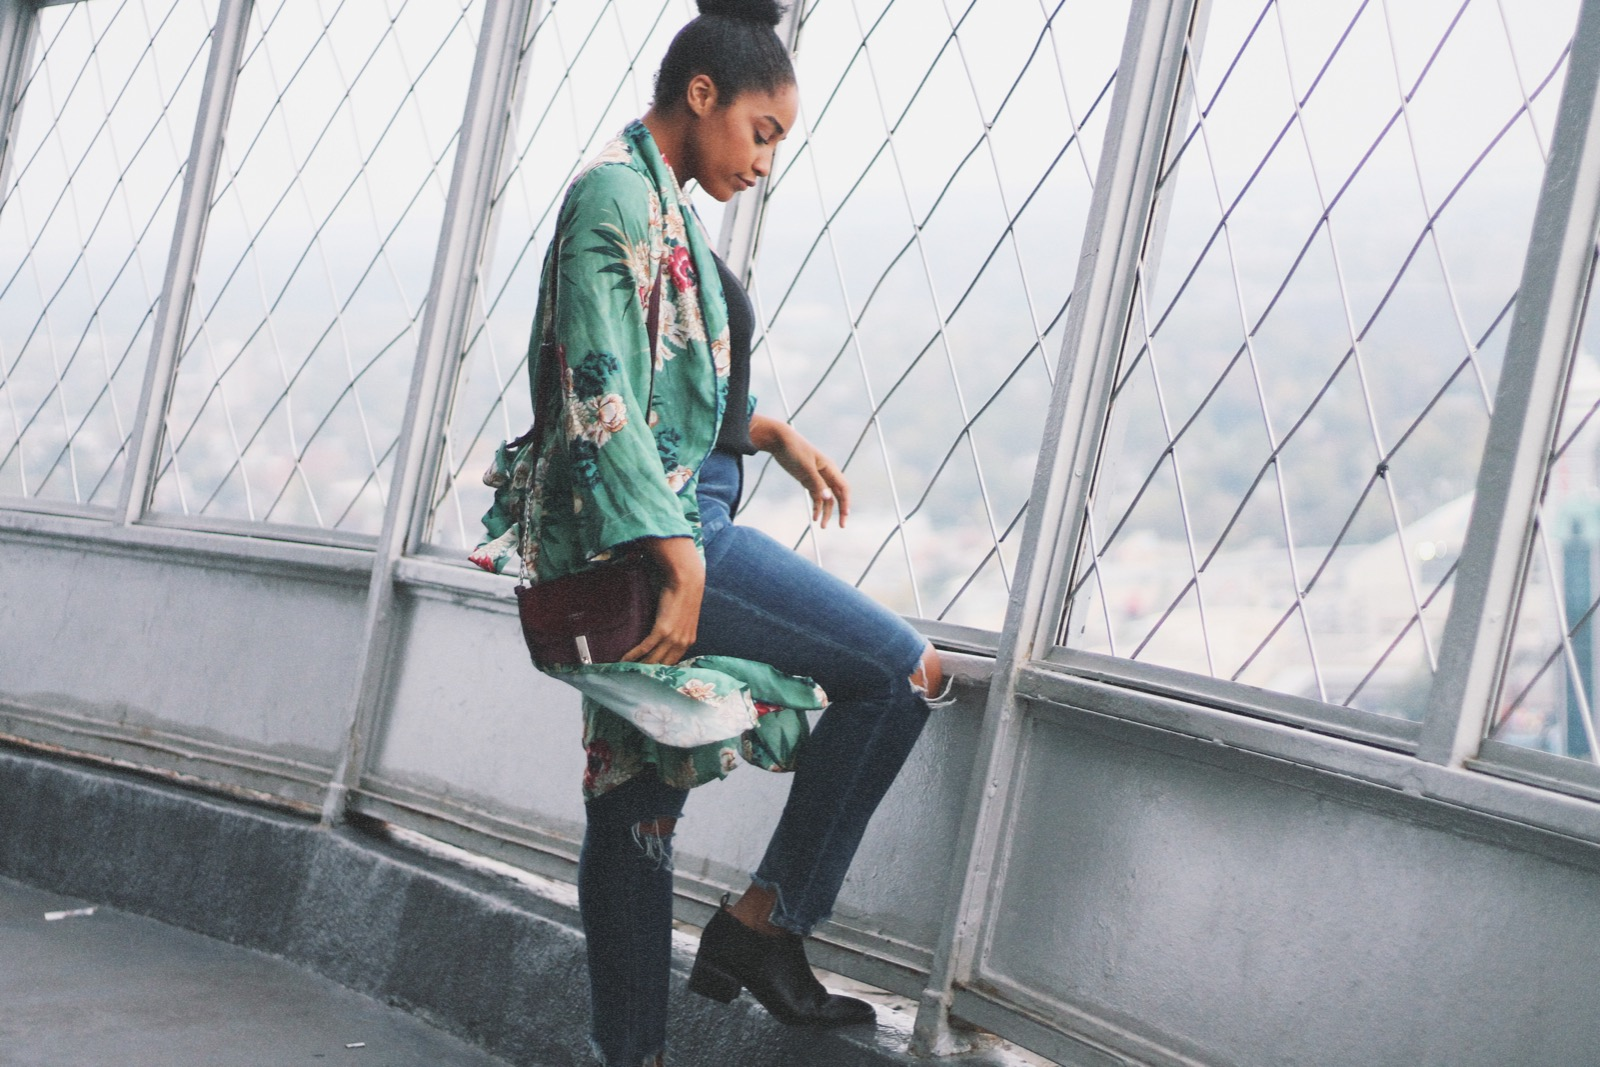 Elaisha Jade at the Skylon Tower in Niagara Falls